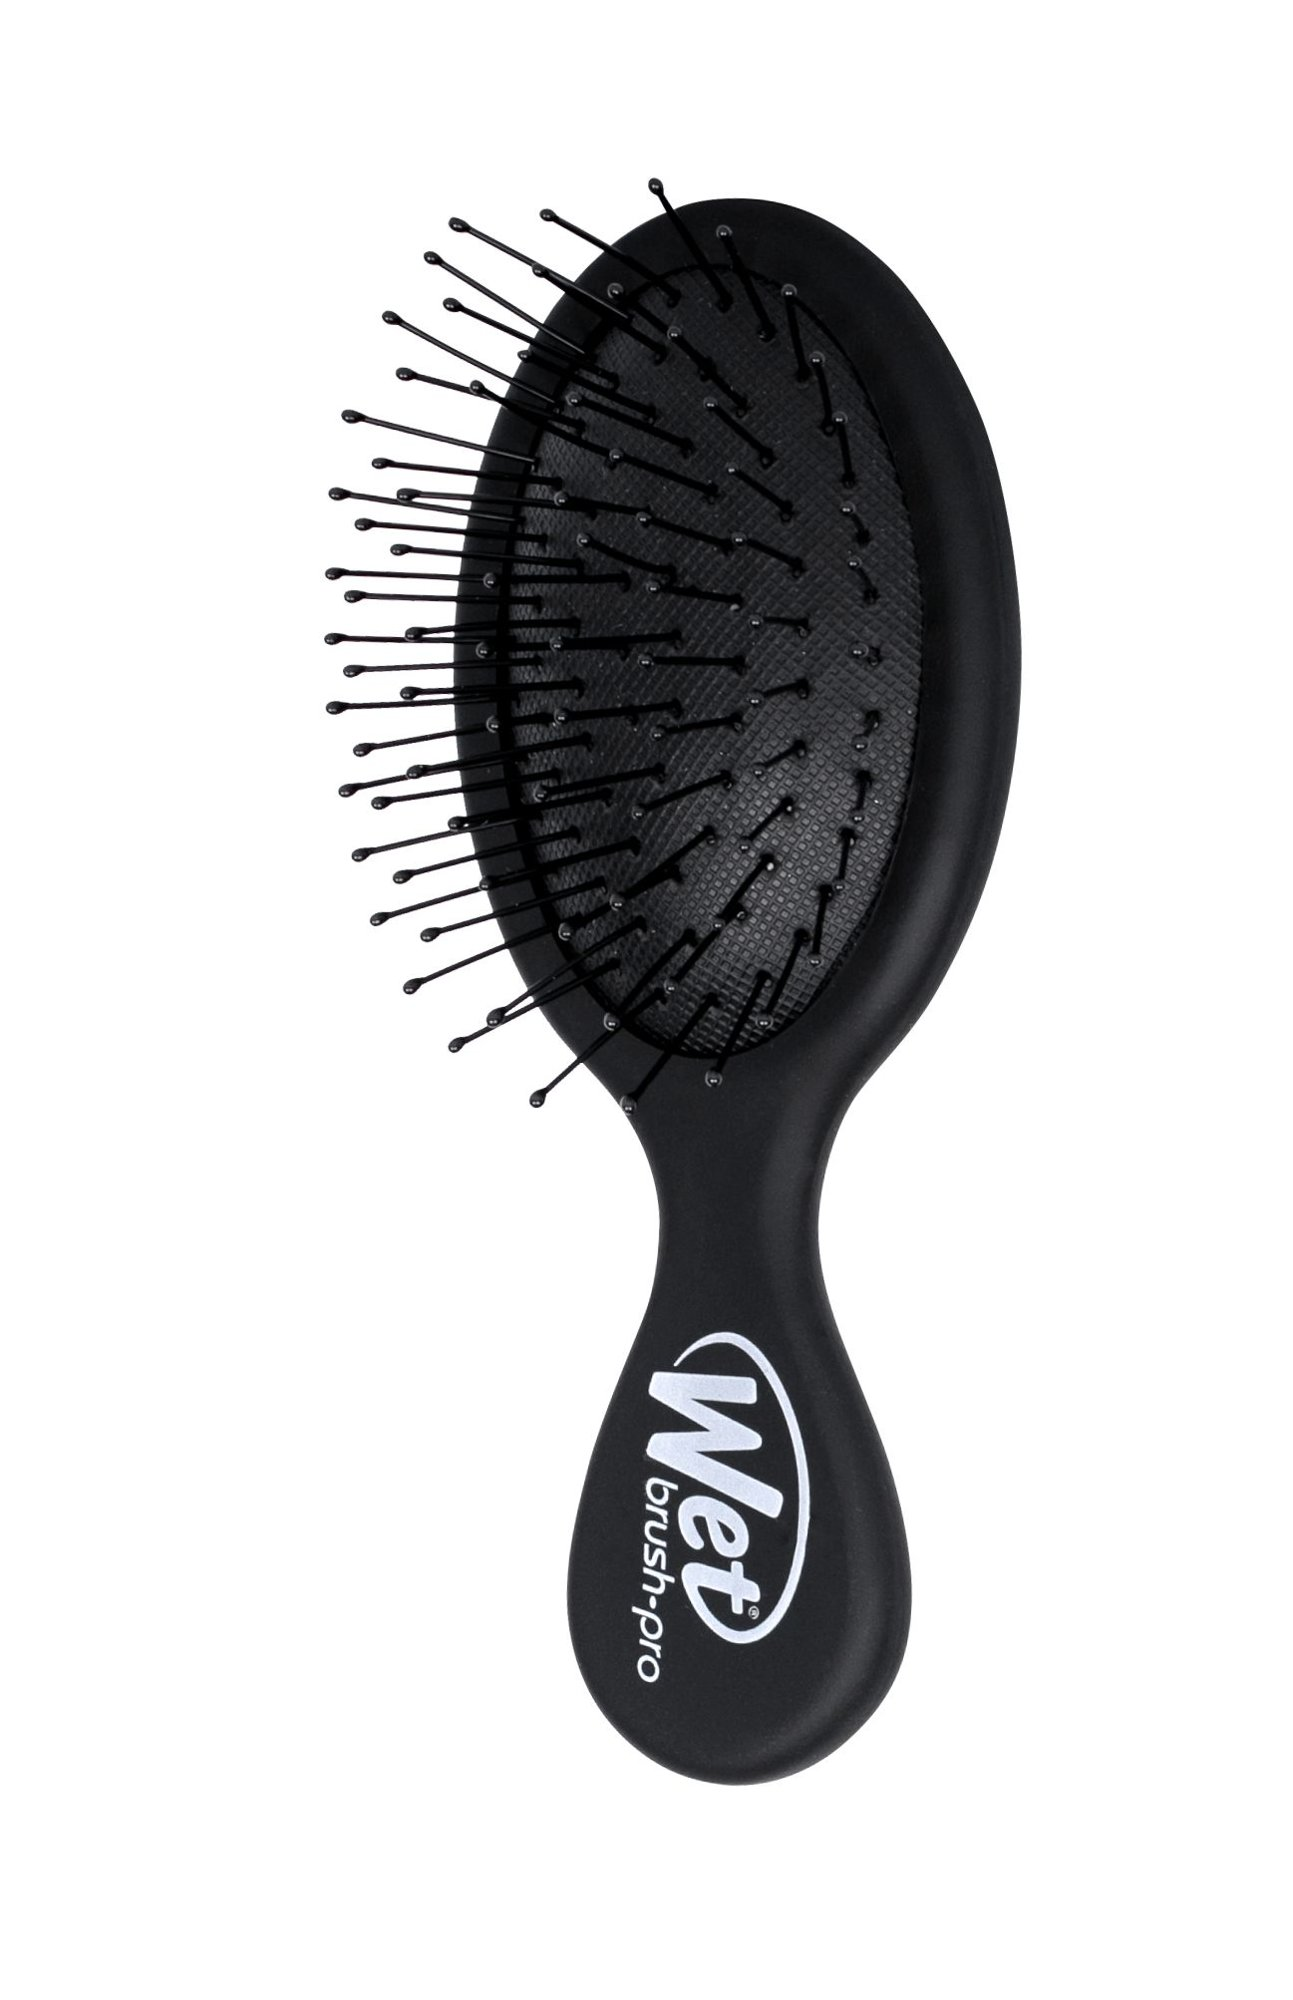 Wet Brush Detangle Professional Hairbrush 1ml Black Mini